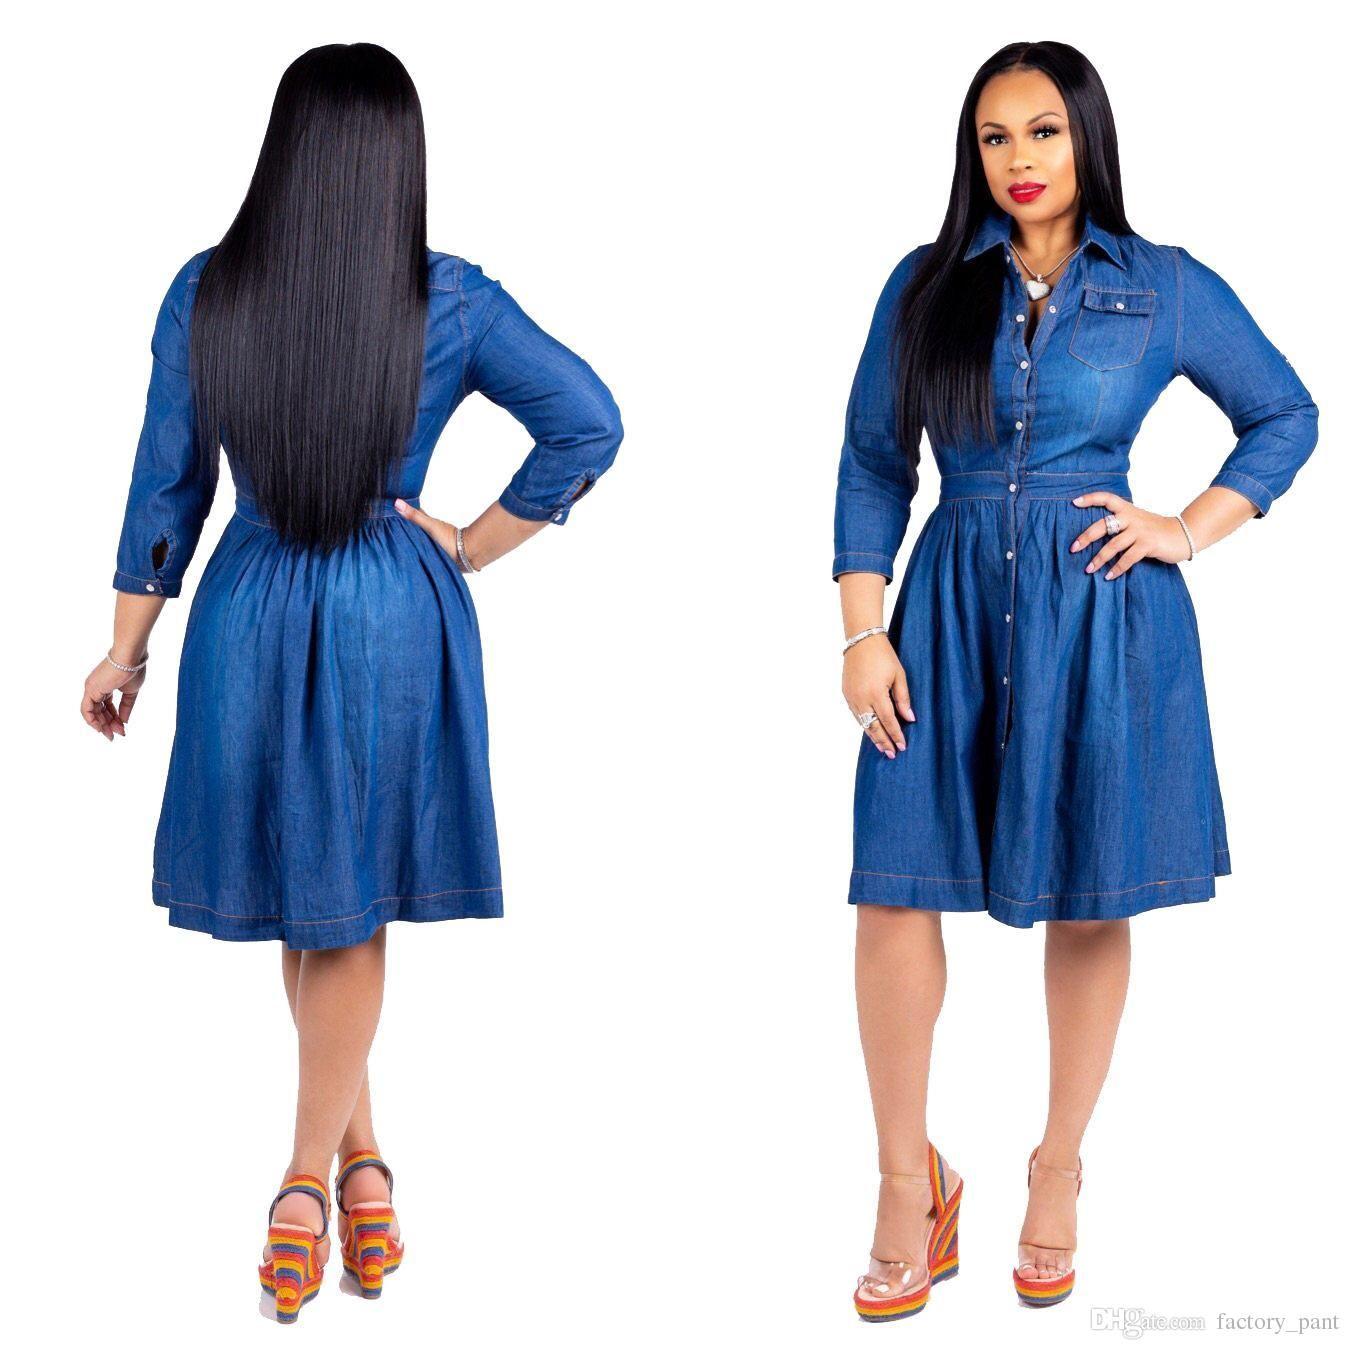 0c920d769 Compre S 3xl Plus Size Mulheres Jeans Dress Turn Down Collar Bolsos Manga  Longa Flare Ocasional Do Vintage Midi Denim Dress Vestidos De Aaa_stores,  ...